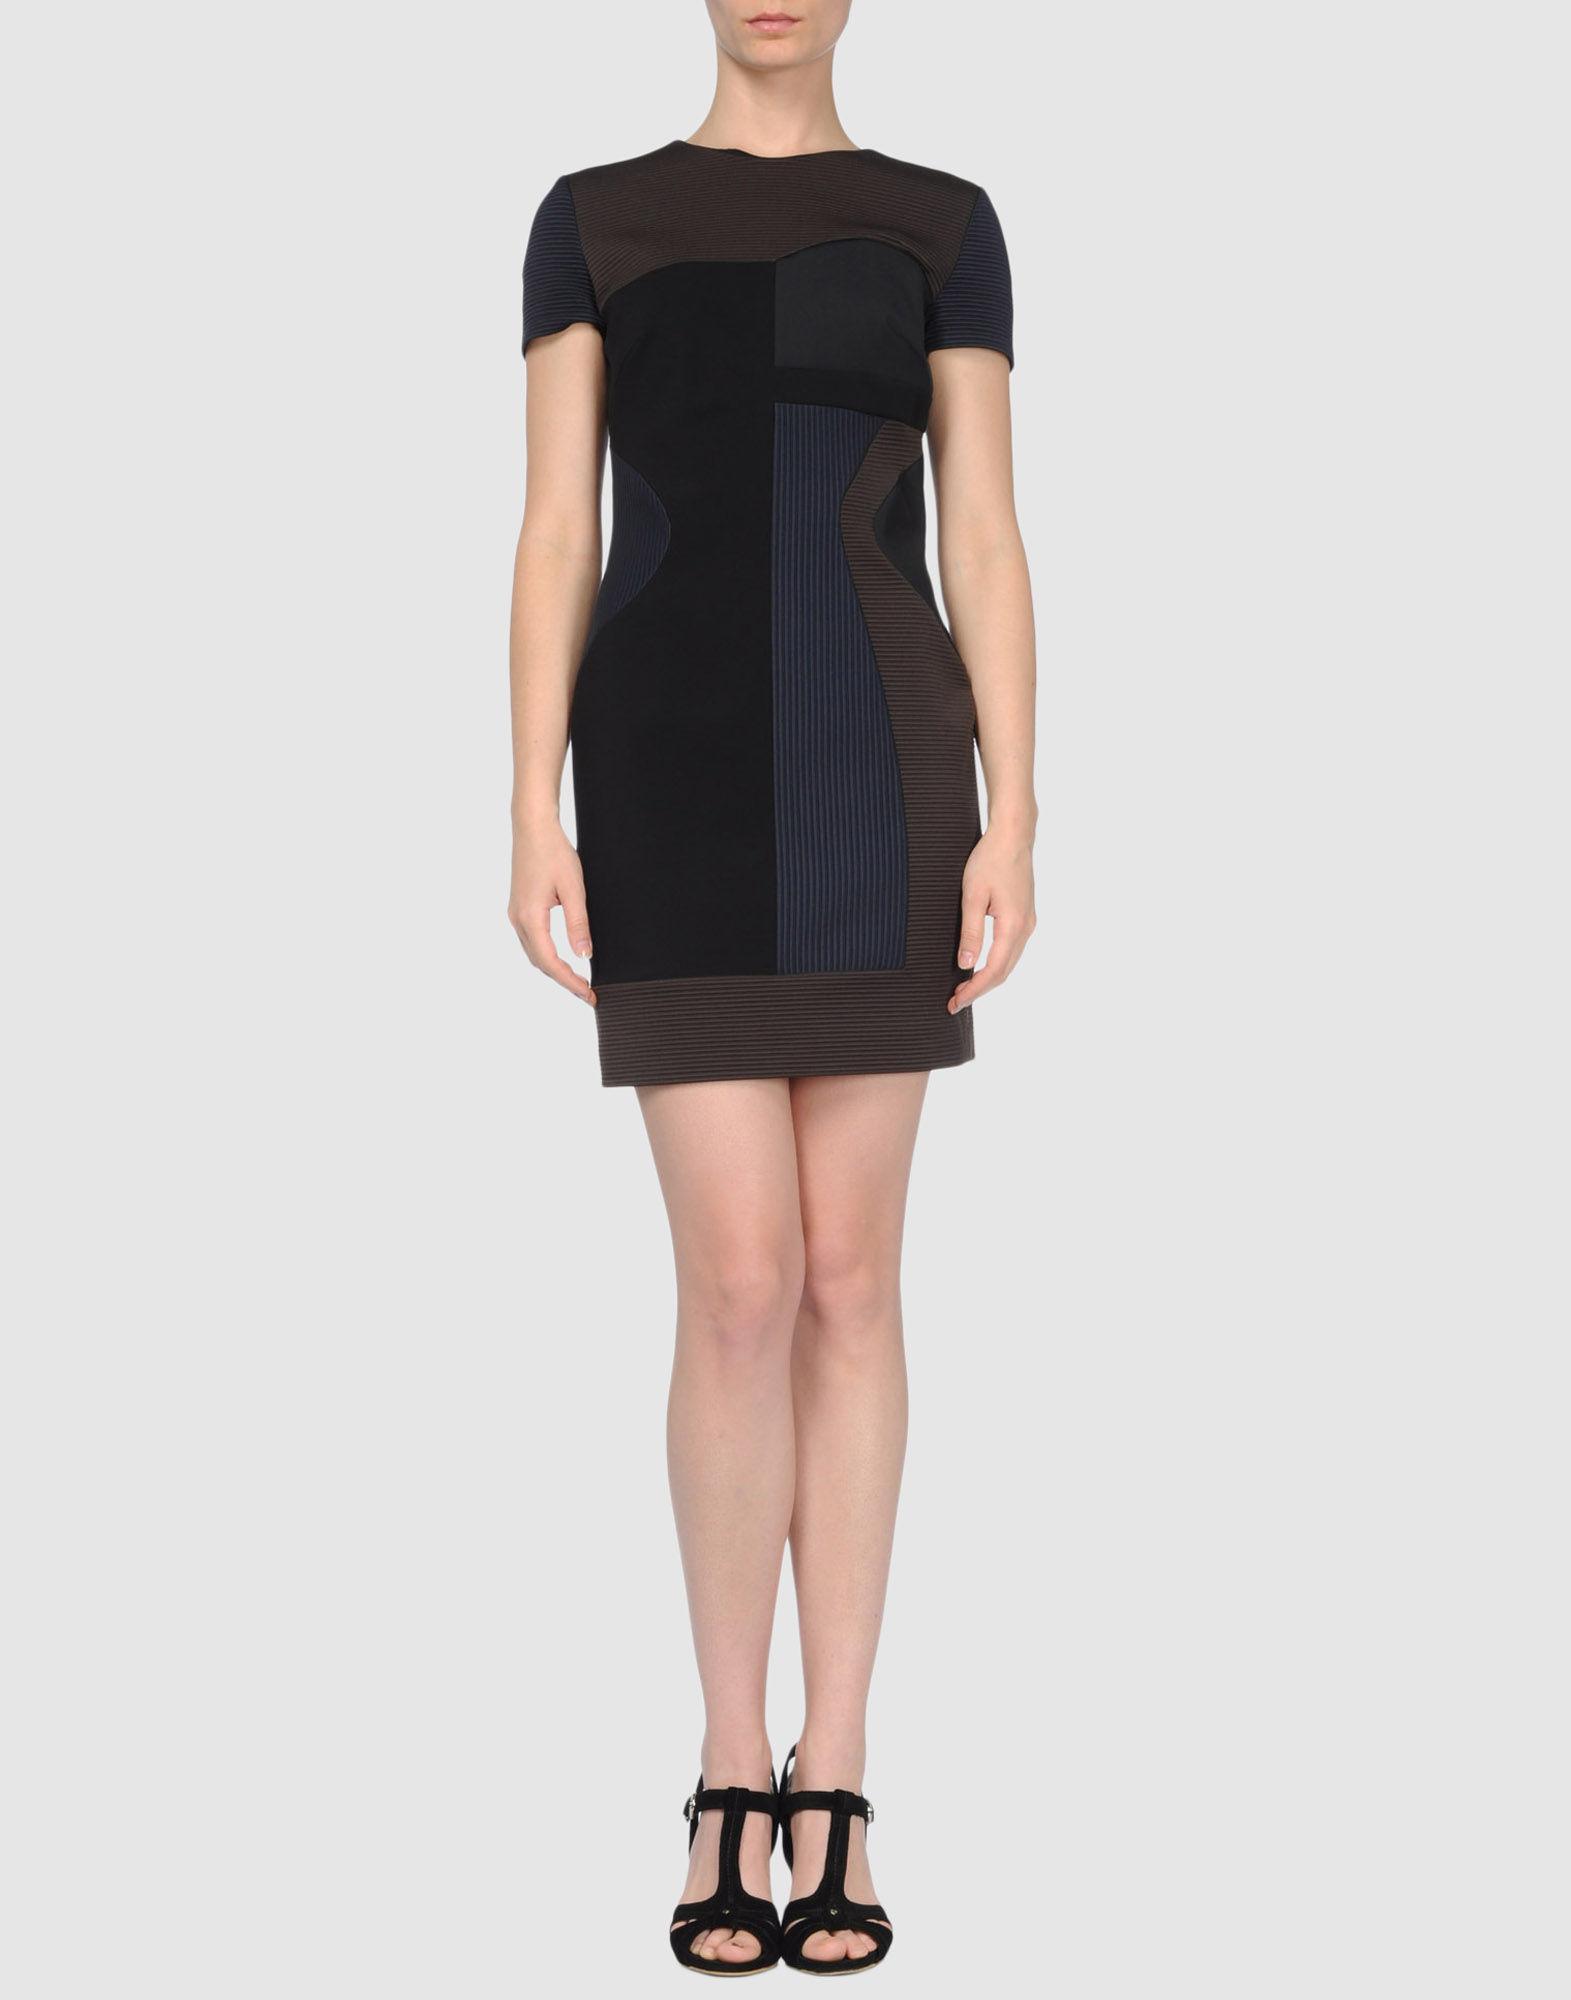 34209896GT 14 f - Evening Φορεματα Versace 2011 2012 Κωδ.02